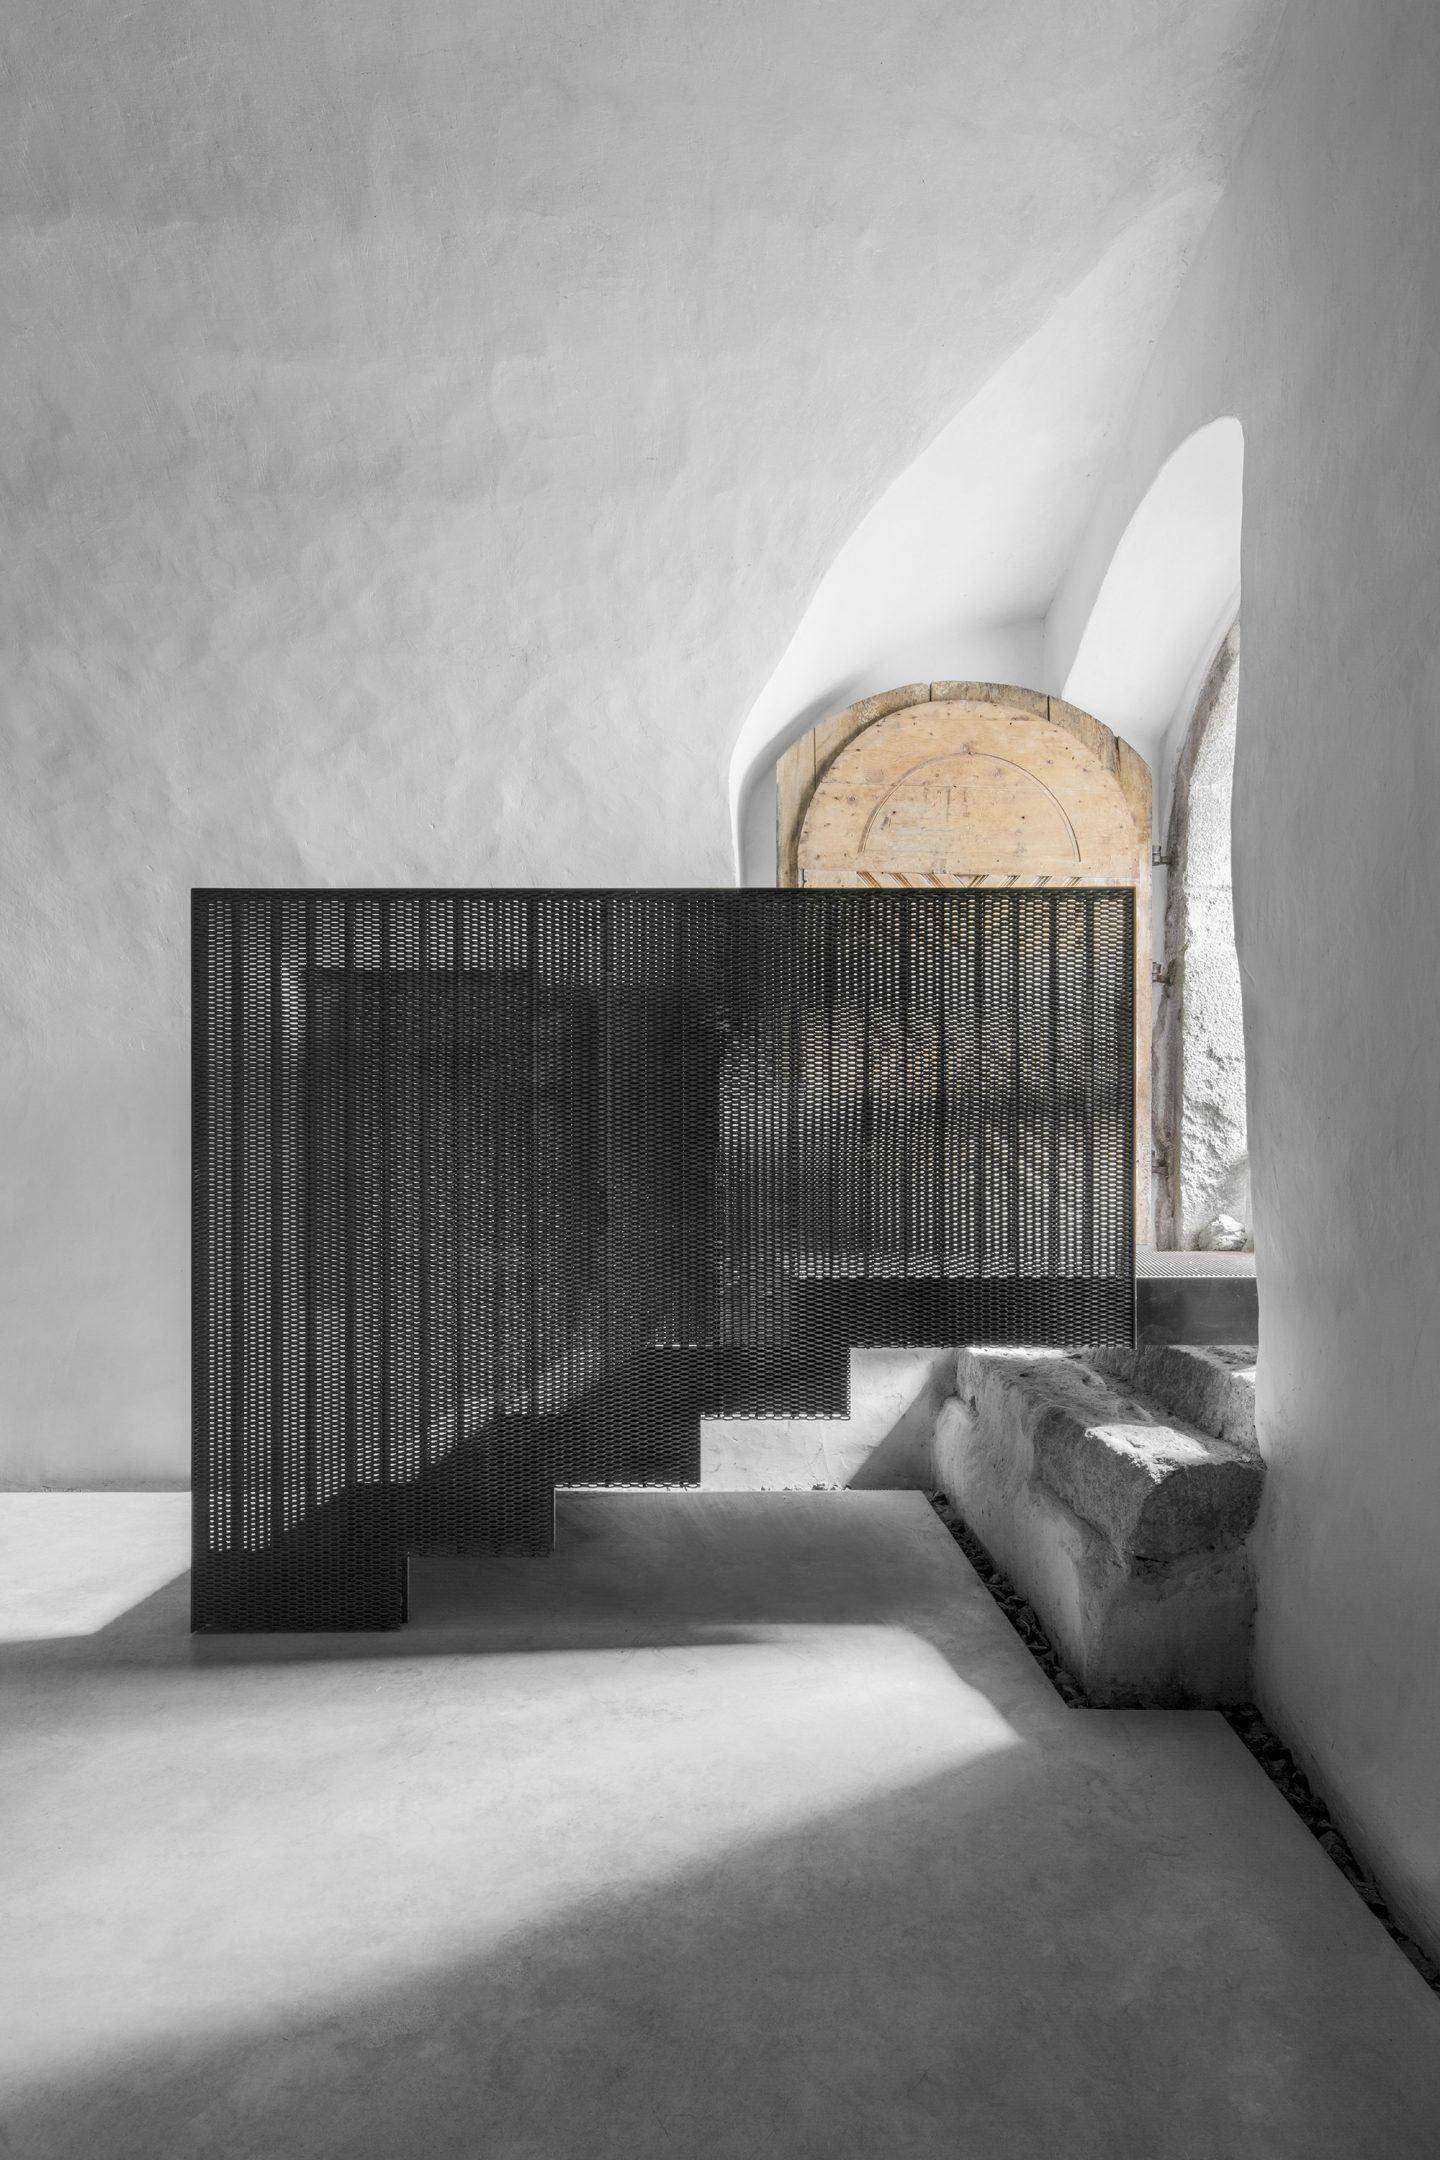 IGNANT-Architecture-Bergmeisterwolf-Neue-Keller-12